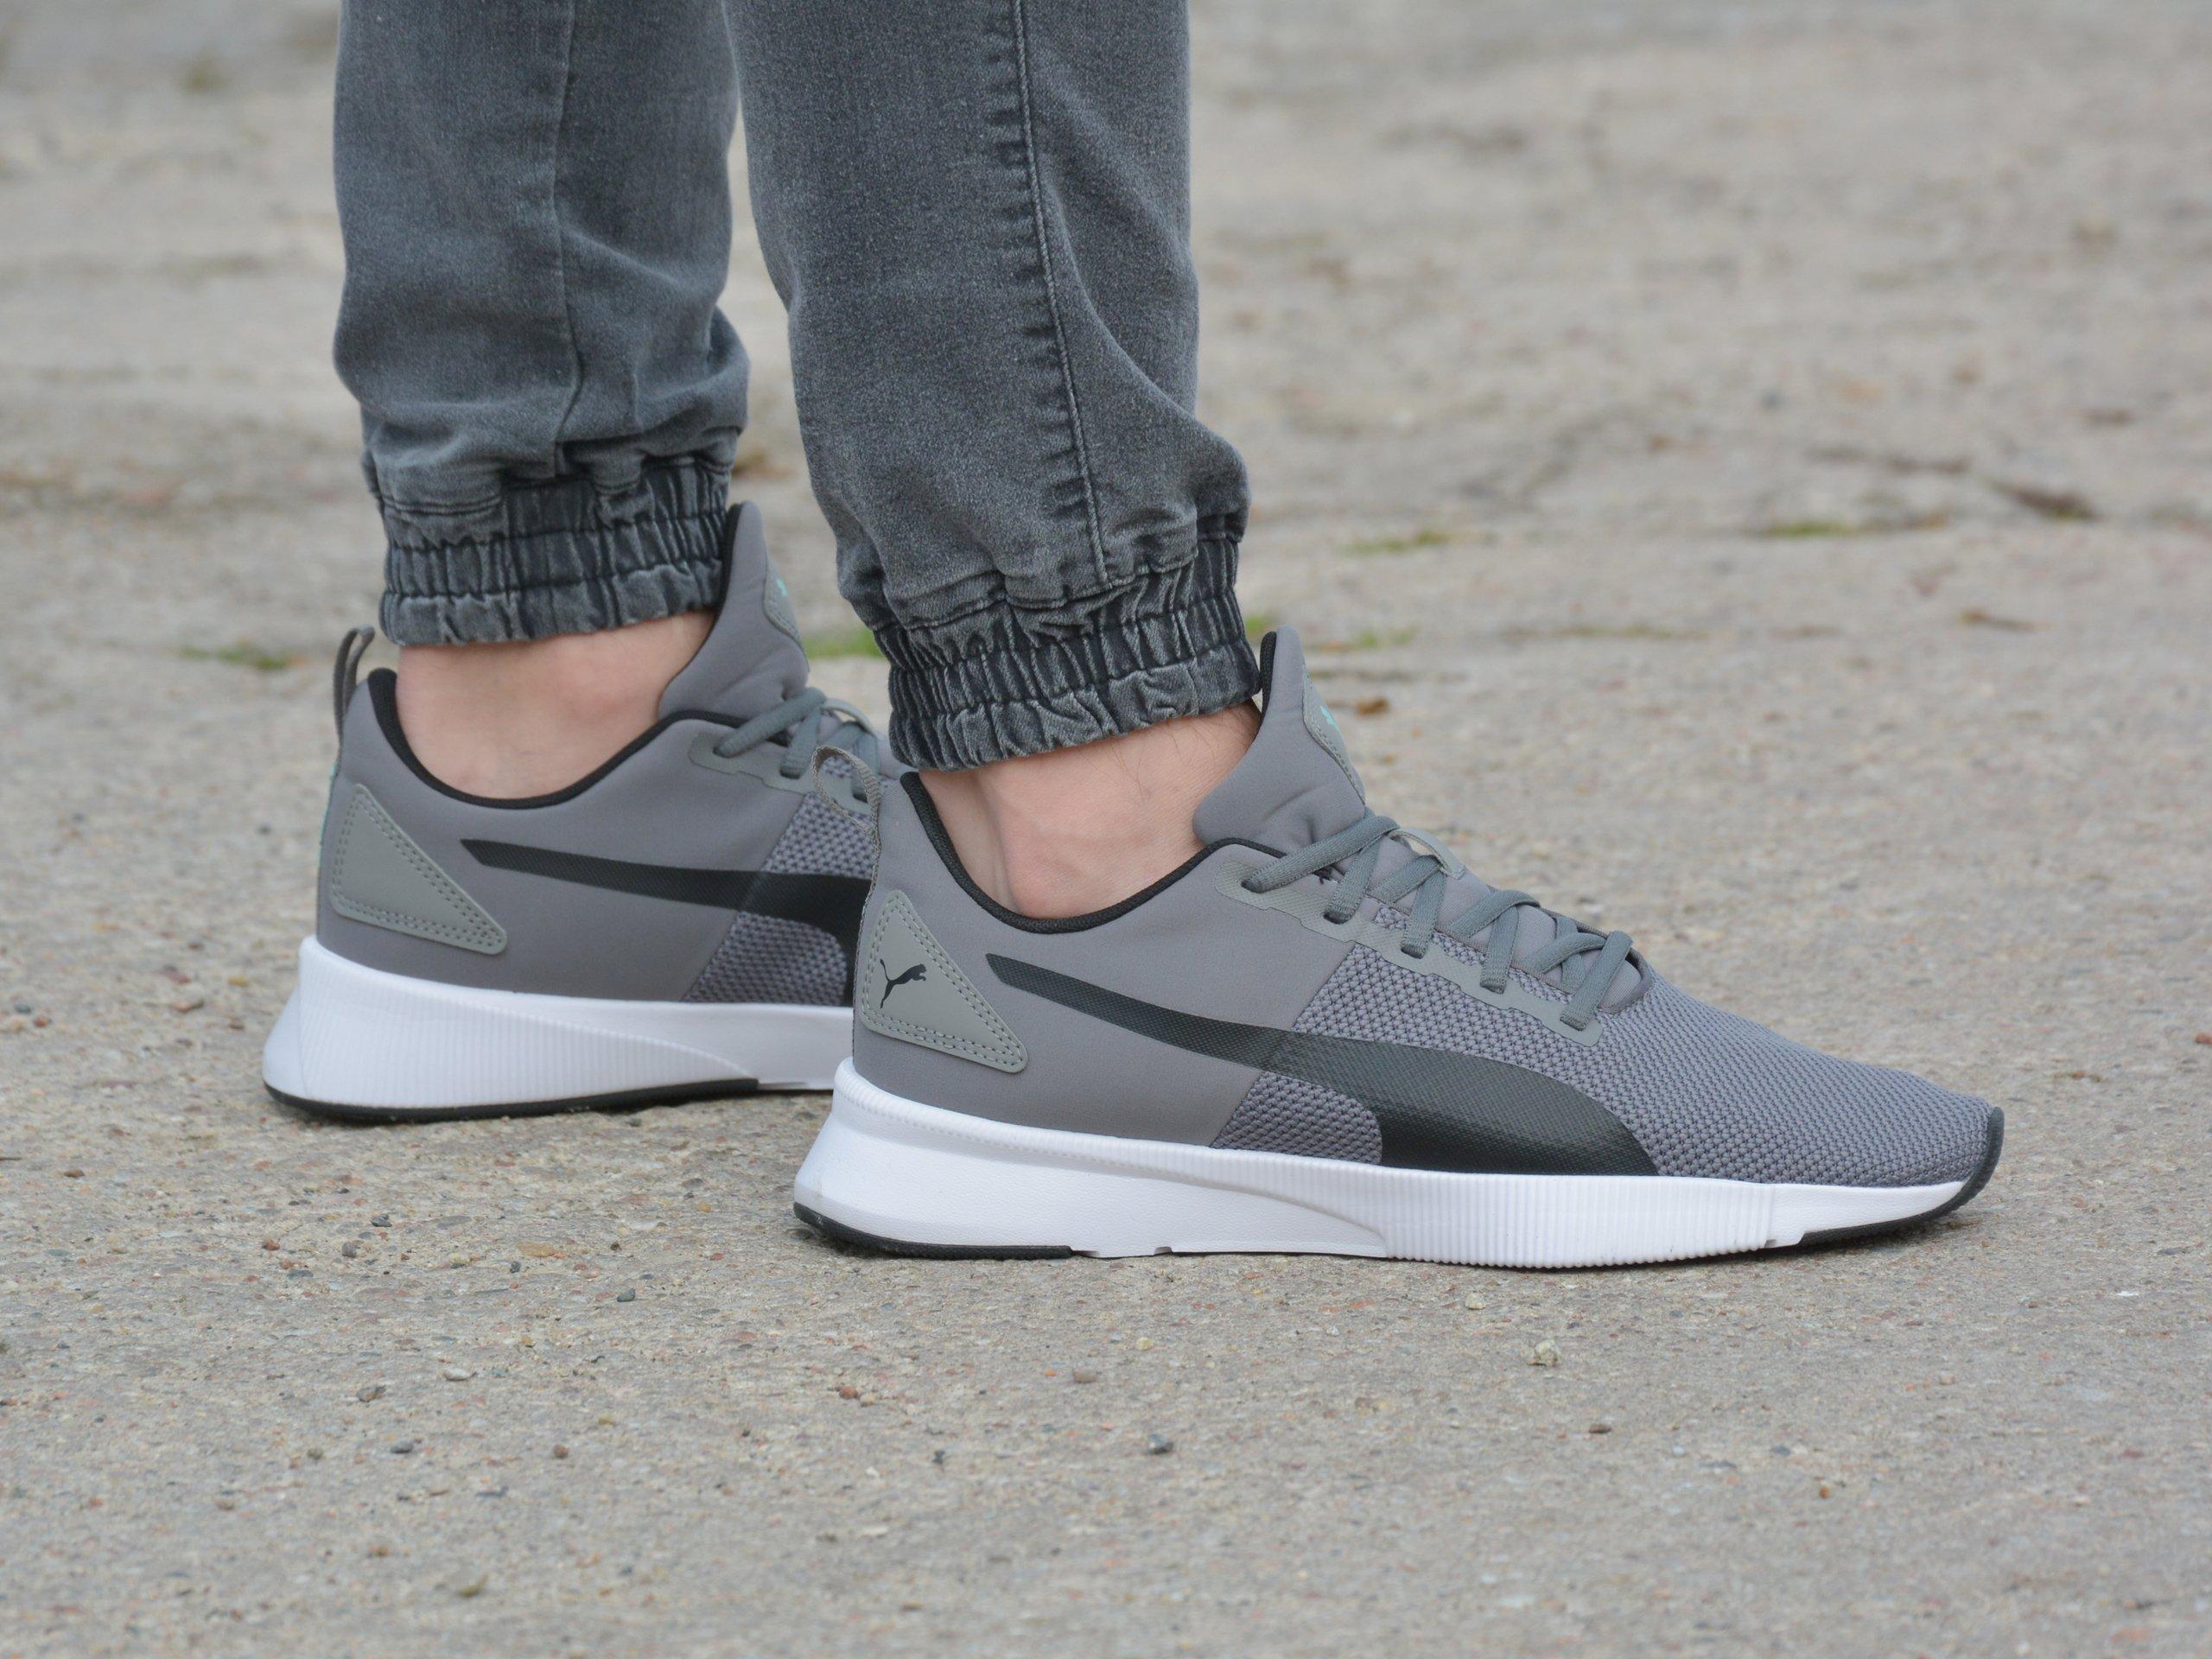 Puma - Flyer Runner 192257-10 - Sneakers - Grey | Mens \ Puma ...